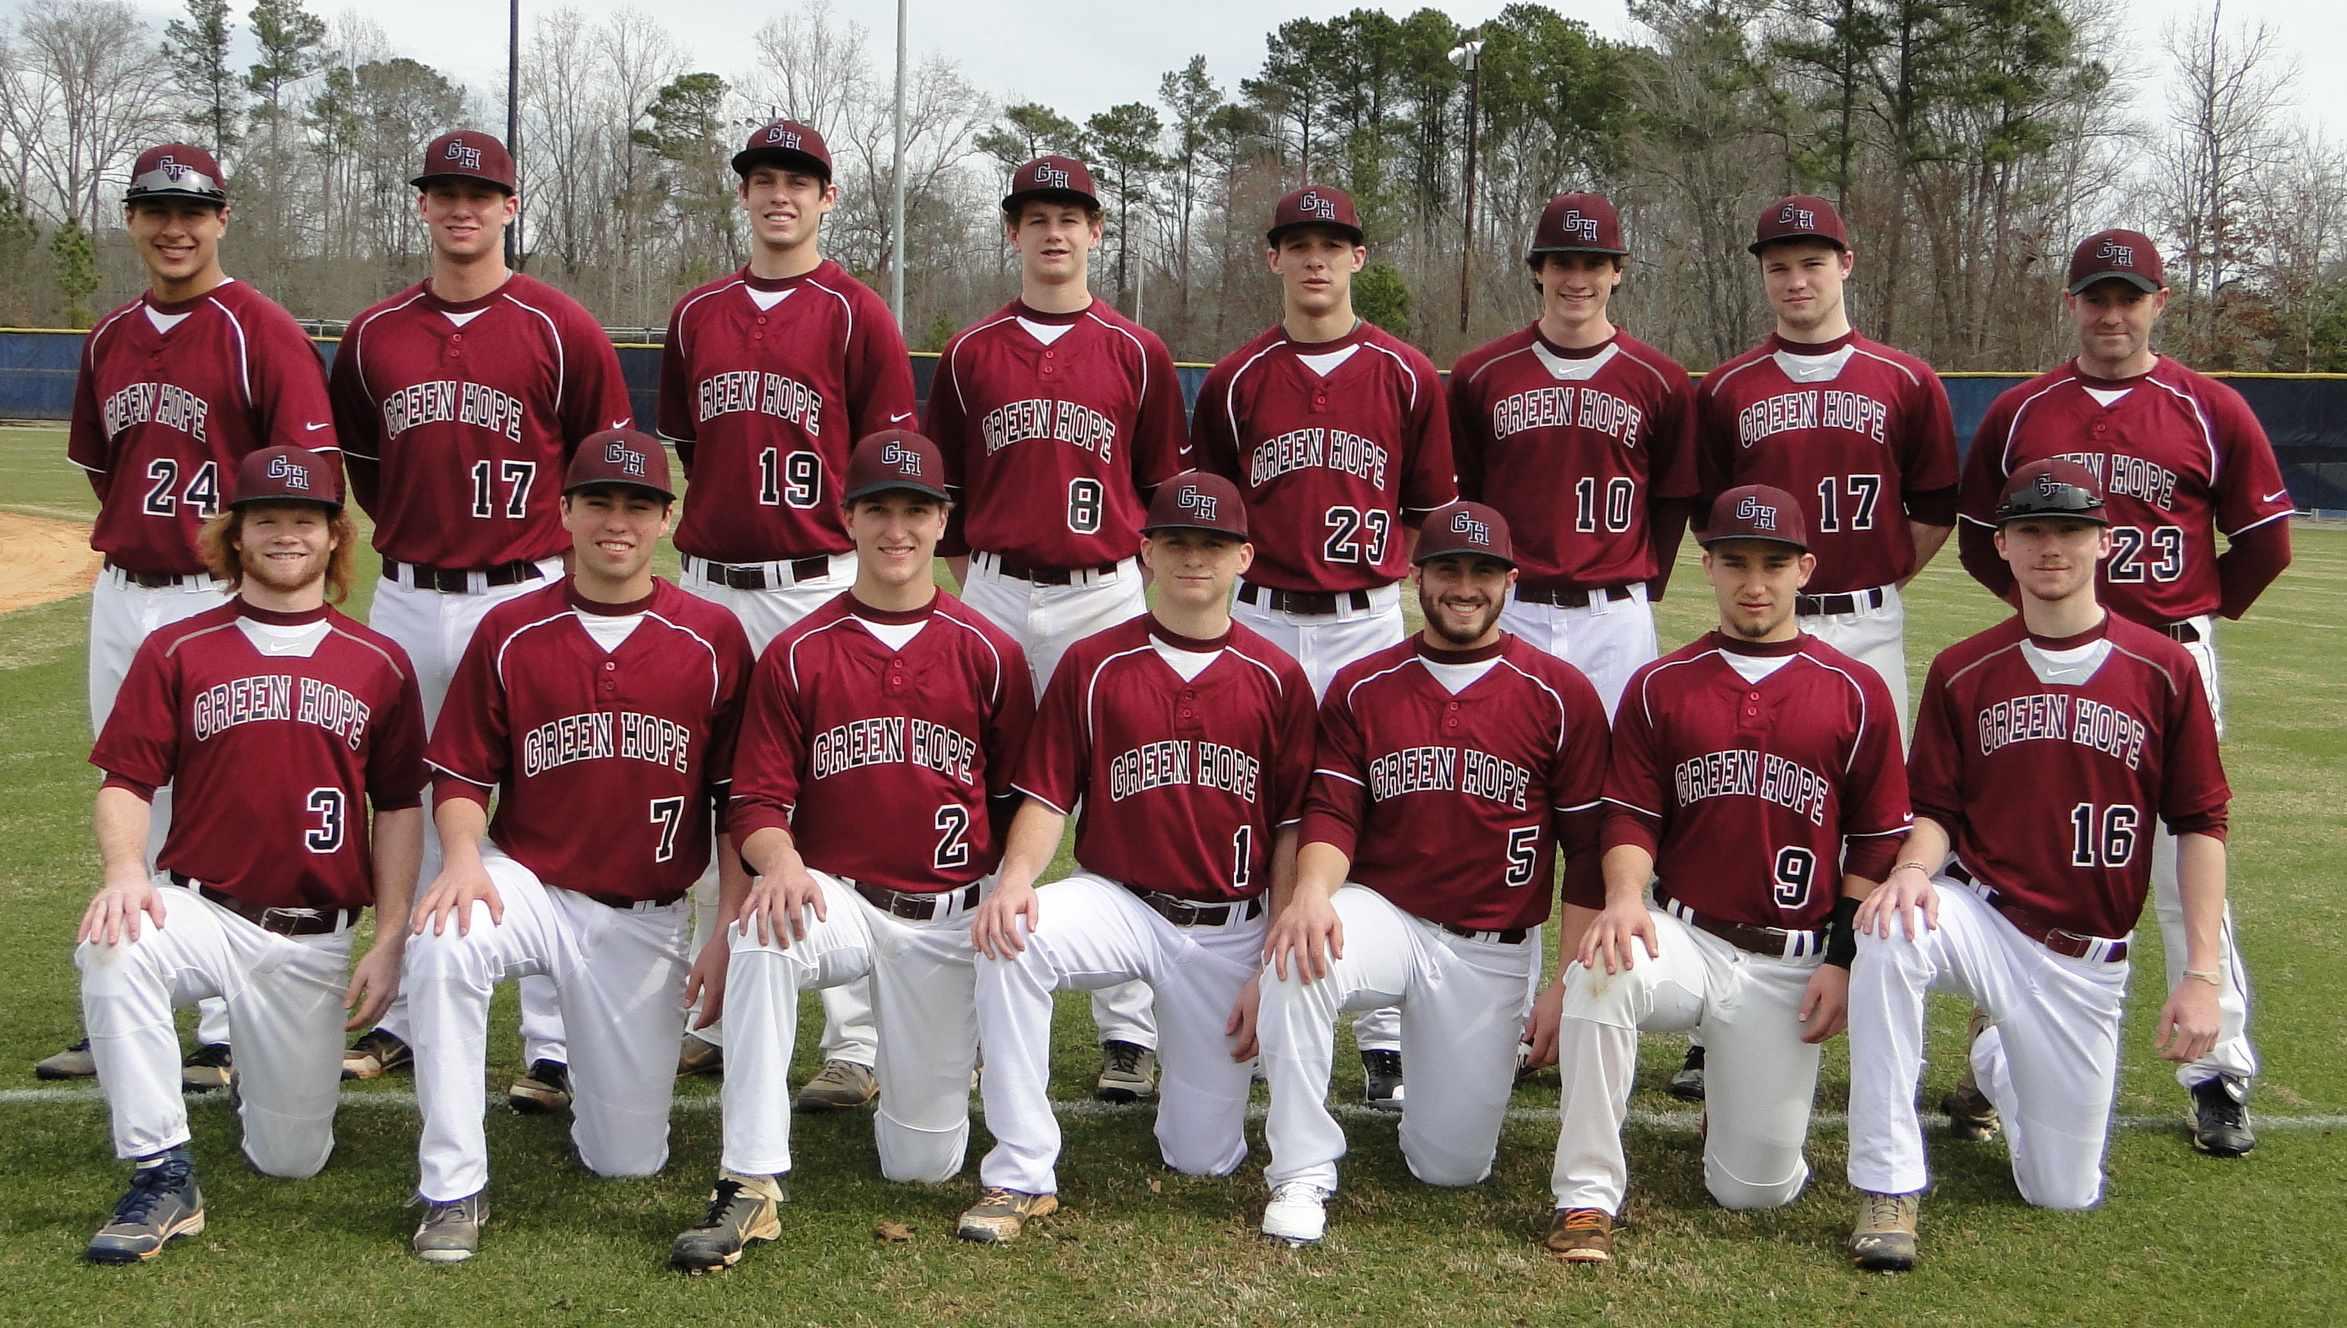 2014 Varsity Team